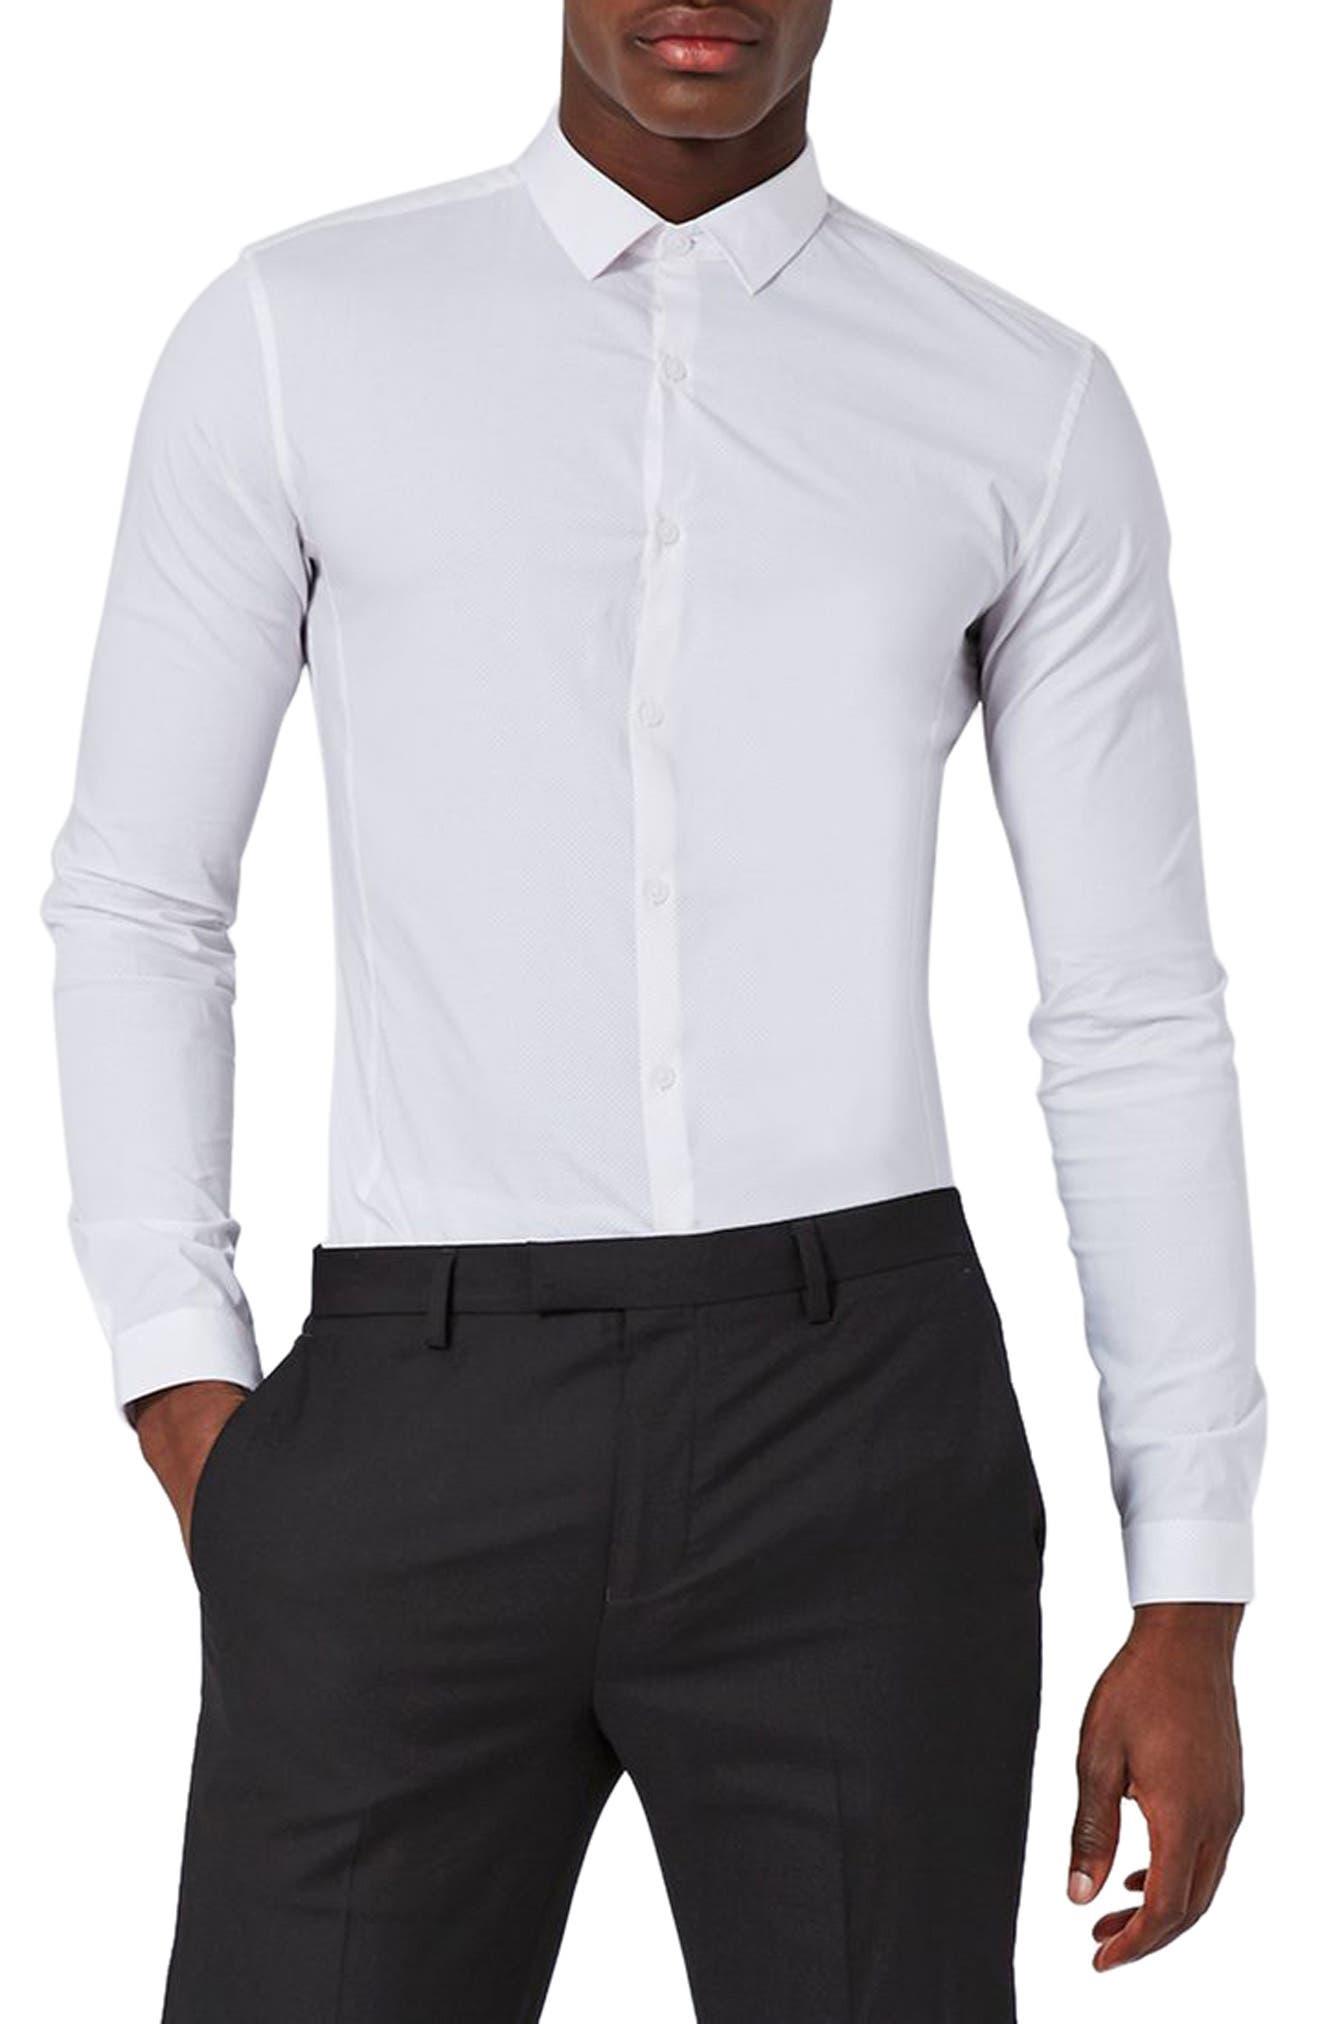 Muscle Fit Polka Dot Shirt,                             Main thumbnail 1, color,                             White